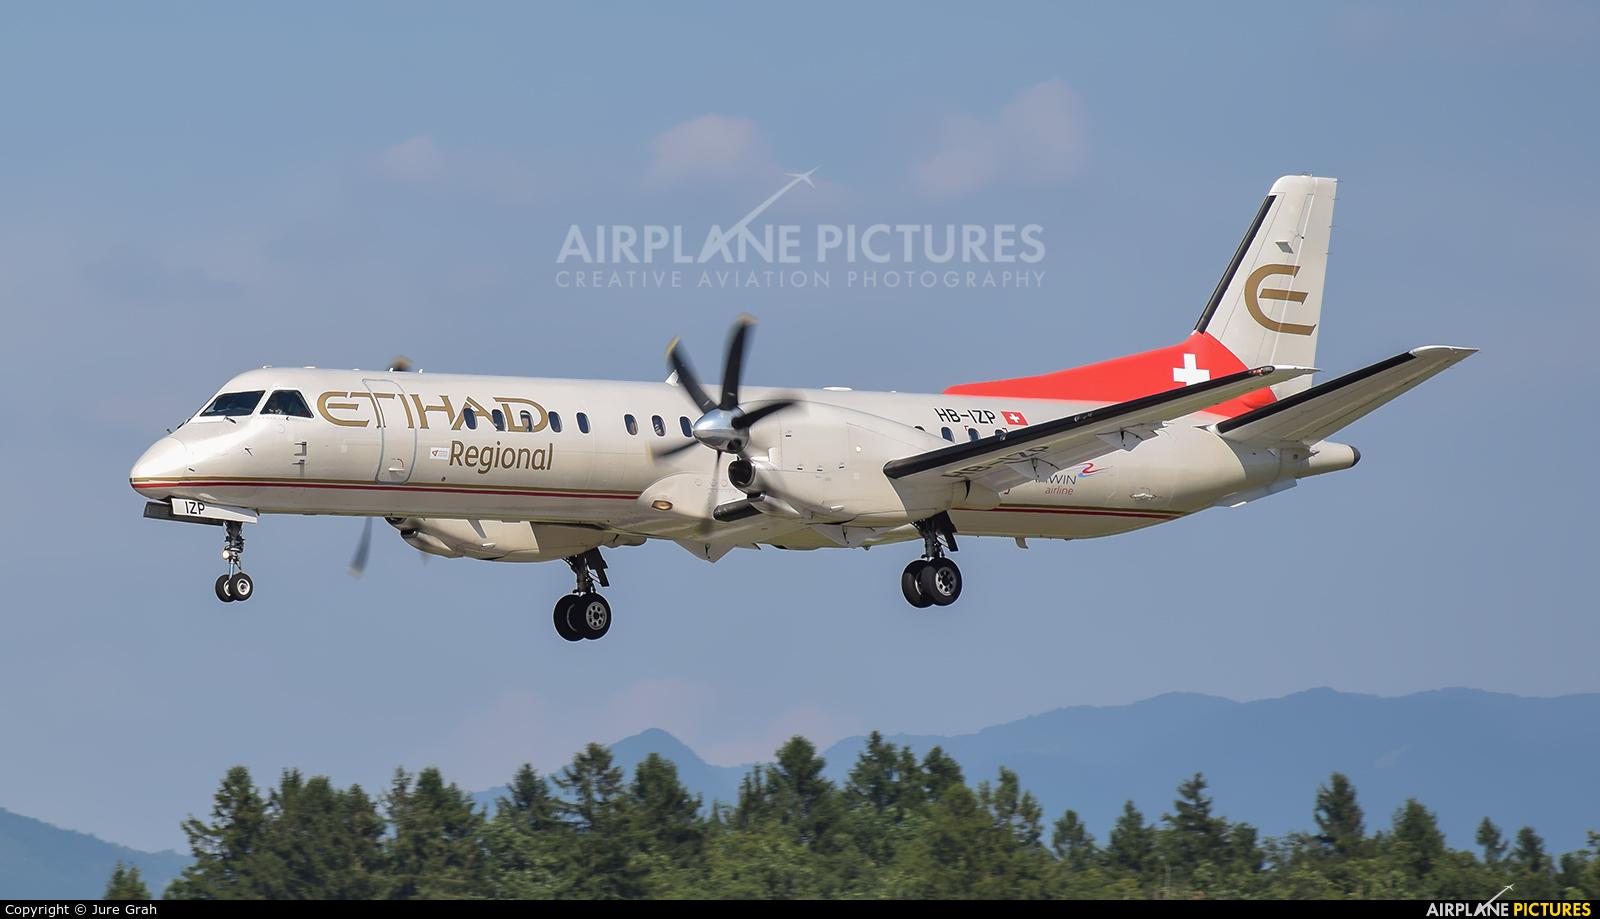 Etihad Regional - Darwin Airlines HB-IZP aircraft at Ljubljana - Brnik